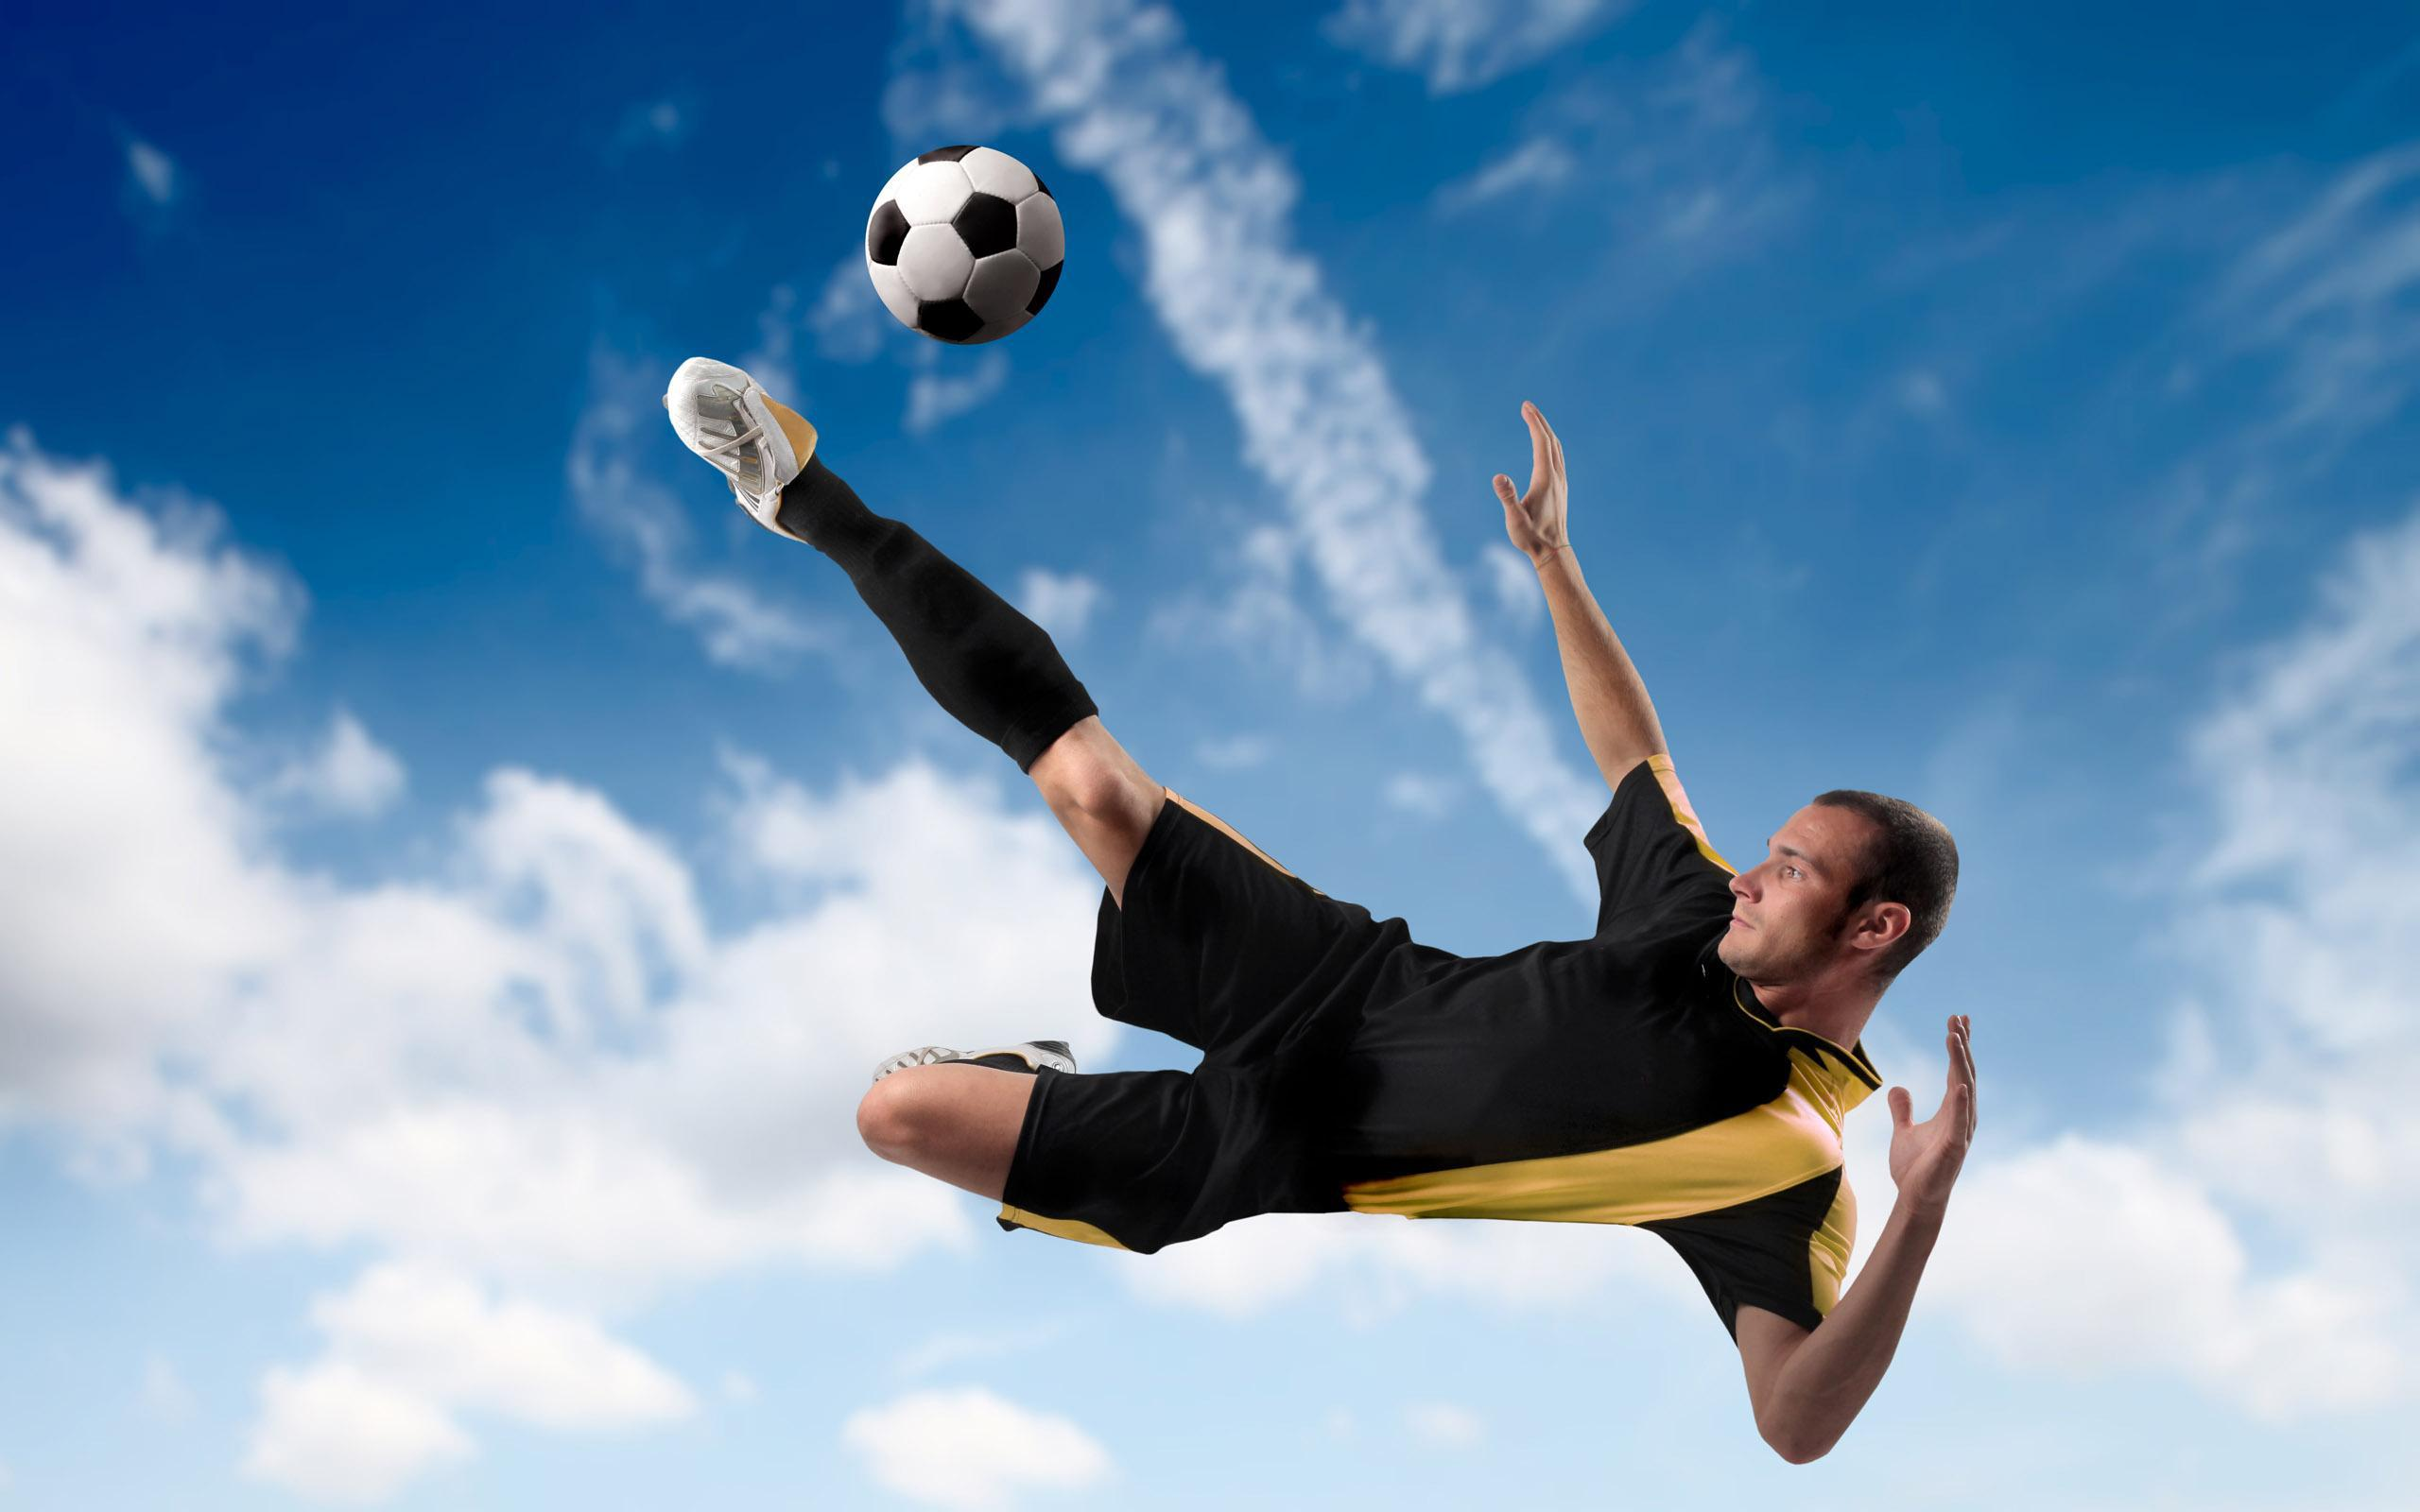 Спортивные картинки картинки